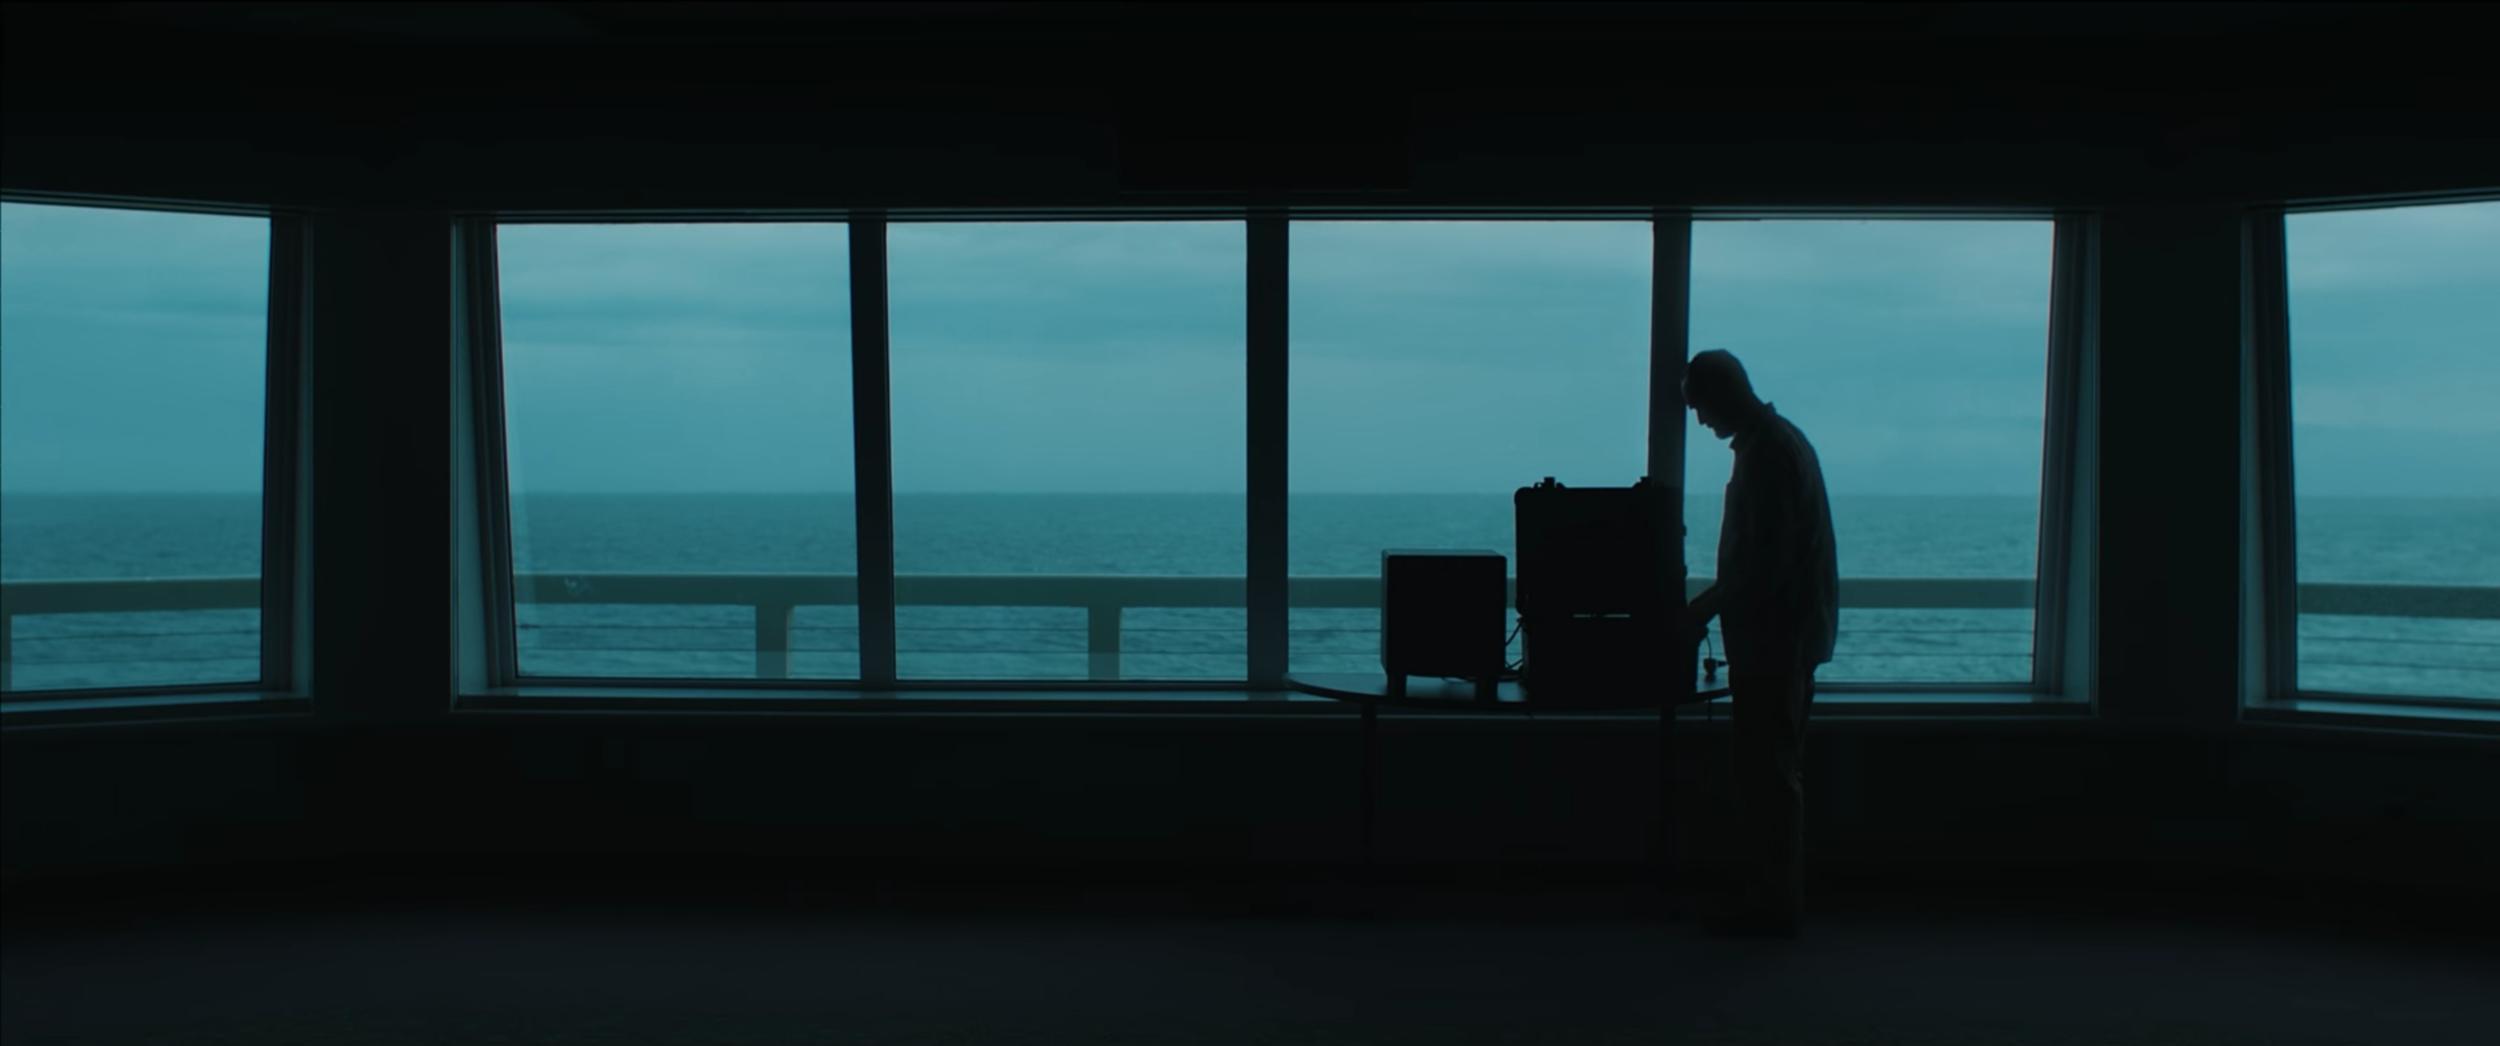 DANIEL AND THE SEA OF SOUND - GOOGLE